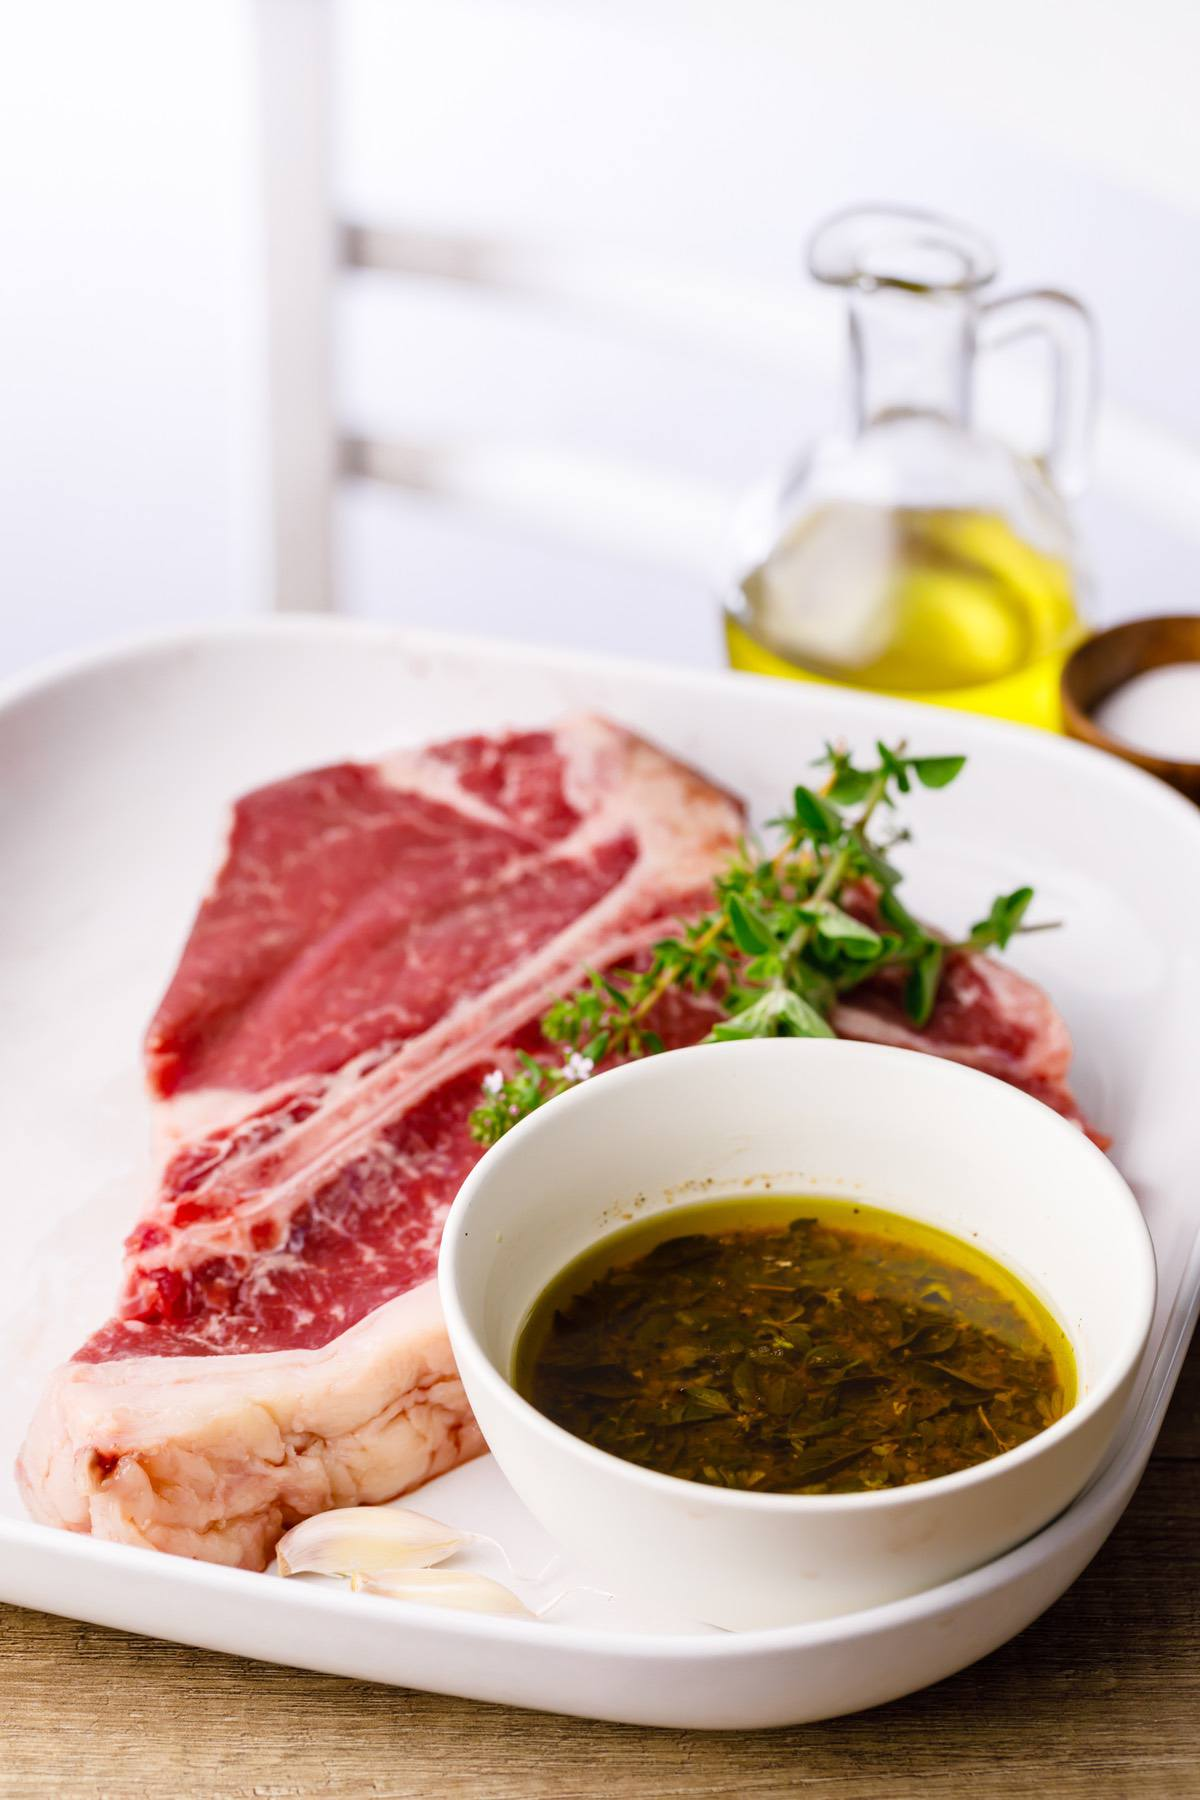 Keto Steak Marinade